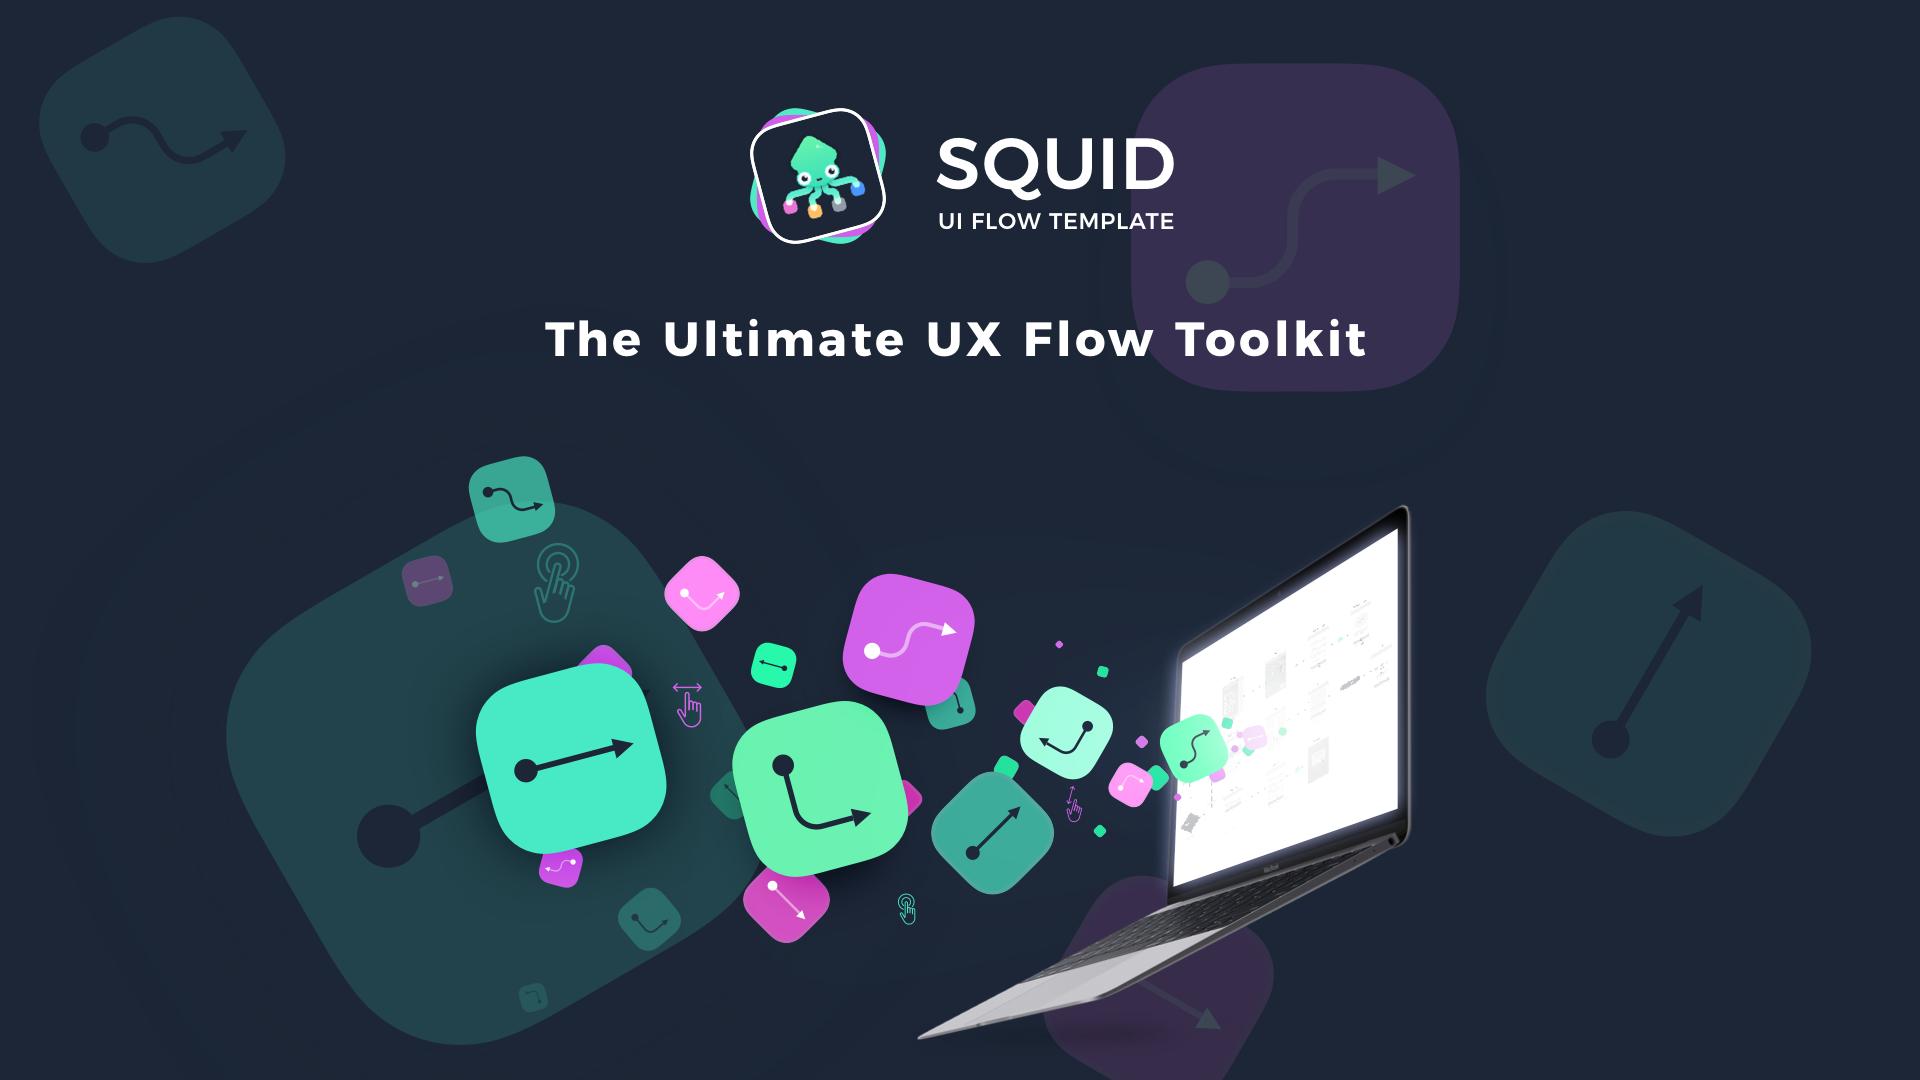 SQUID UI Flow Template - Design Beautiful User Flows faster  UX Flow